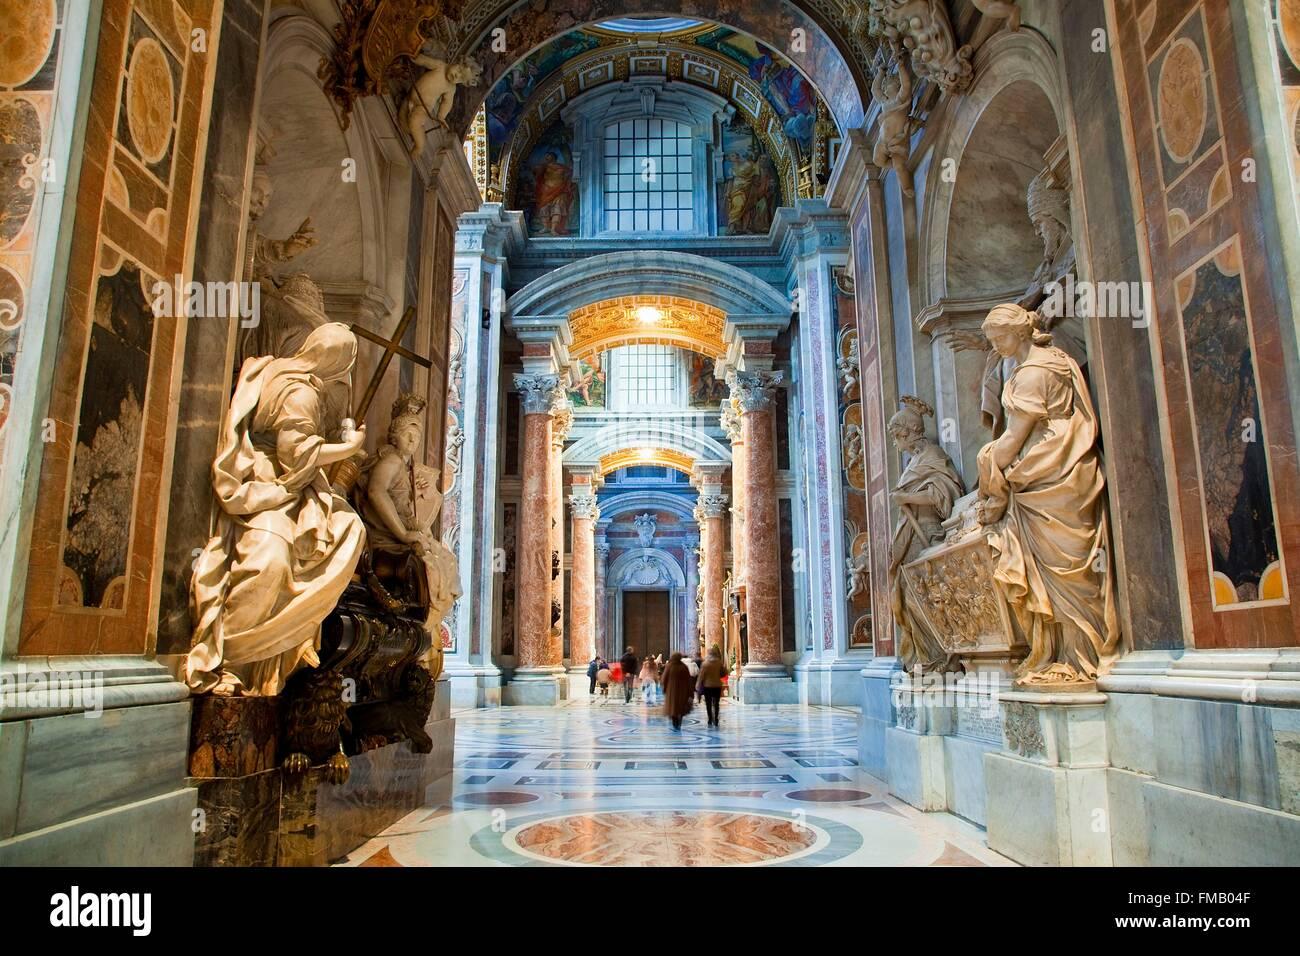 Italien, Latium, Rom, Altstadt Weltkulturerbe von der UNESCO zum Weltkulturerbe der UNESCO, Vatikanstadt die Stockbild